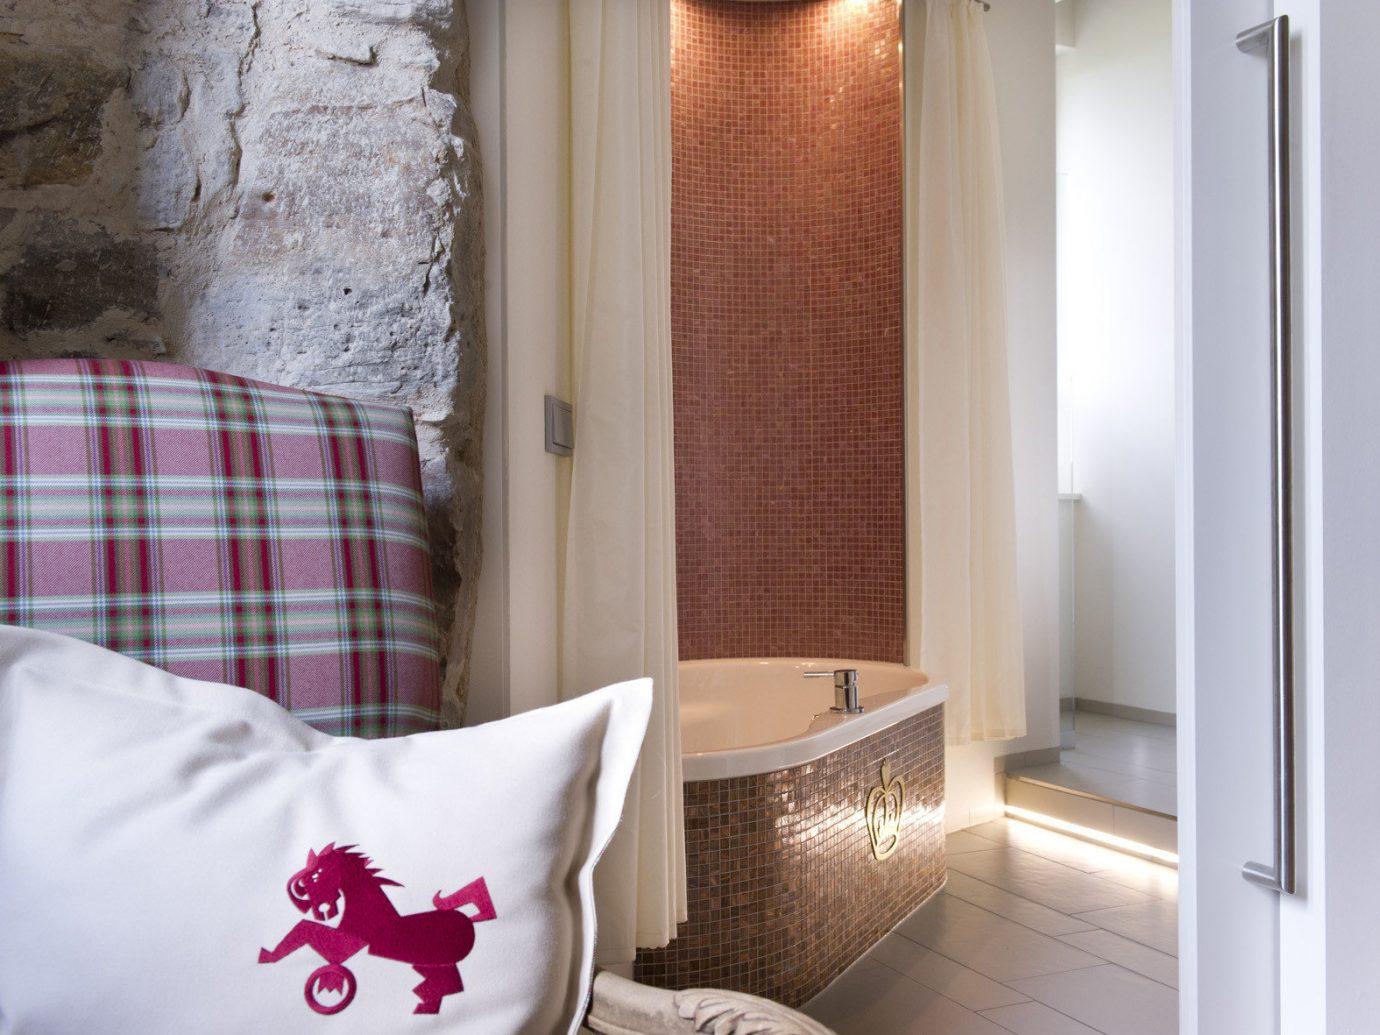 Hotels Landmarks Luxury Travel wall indoor room property interior design Suite window home floor window treatment curtain flooring interior designer colored